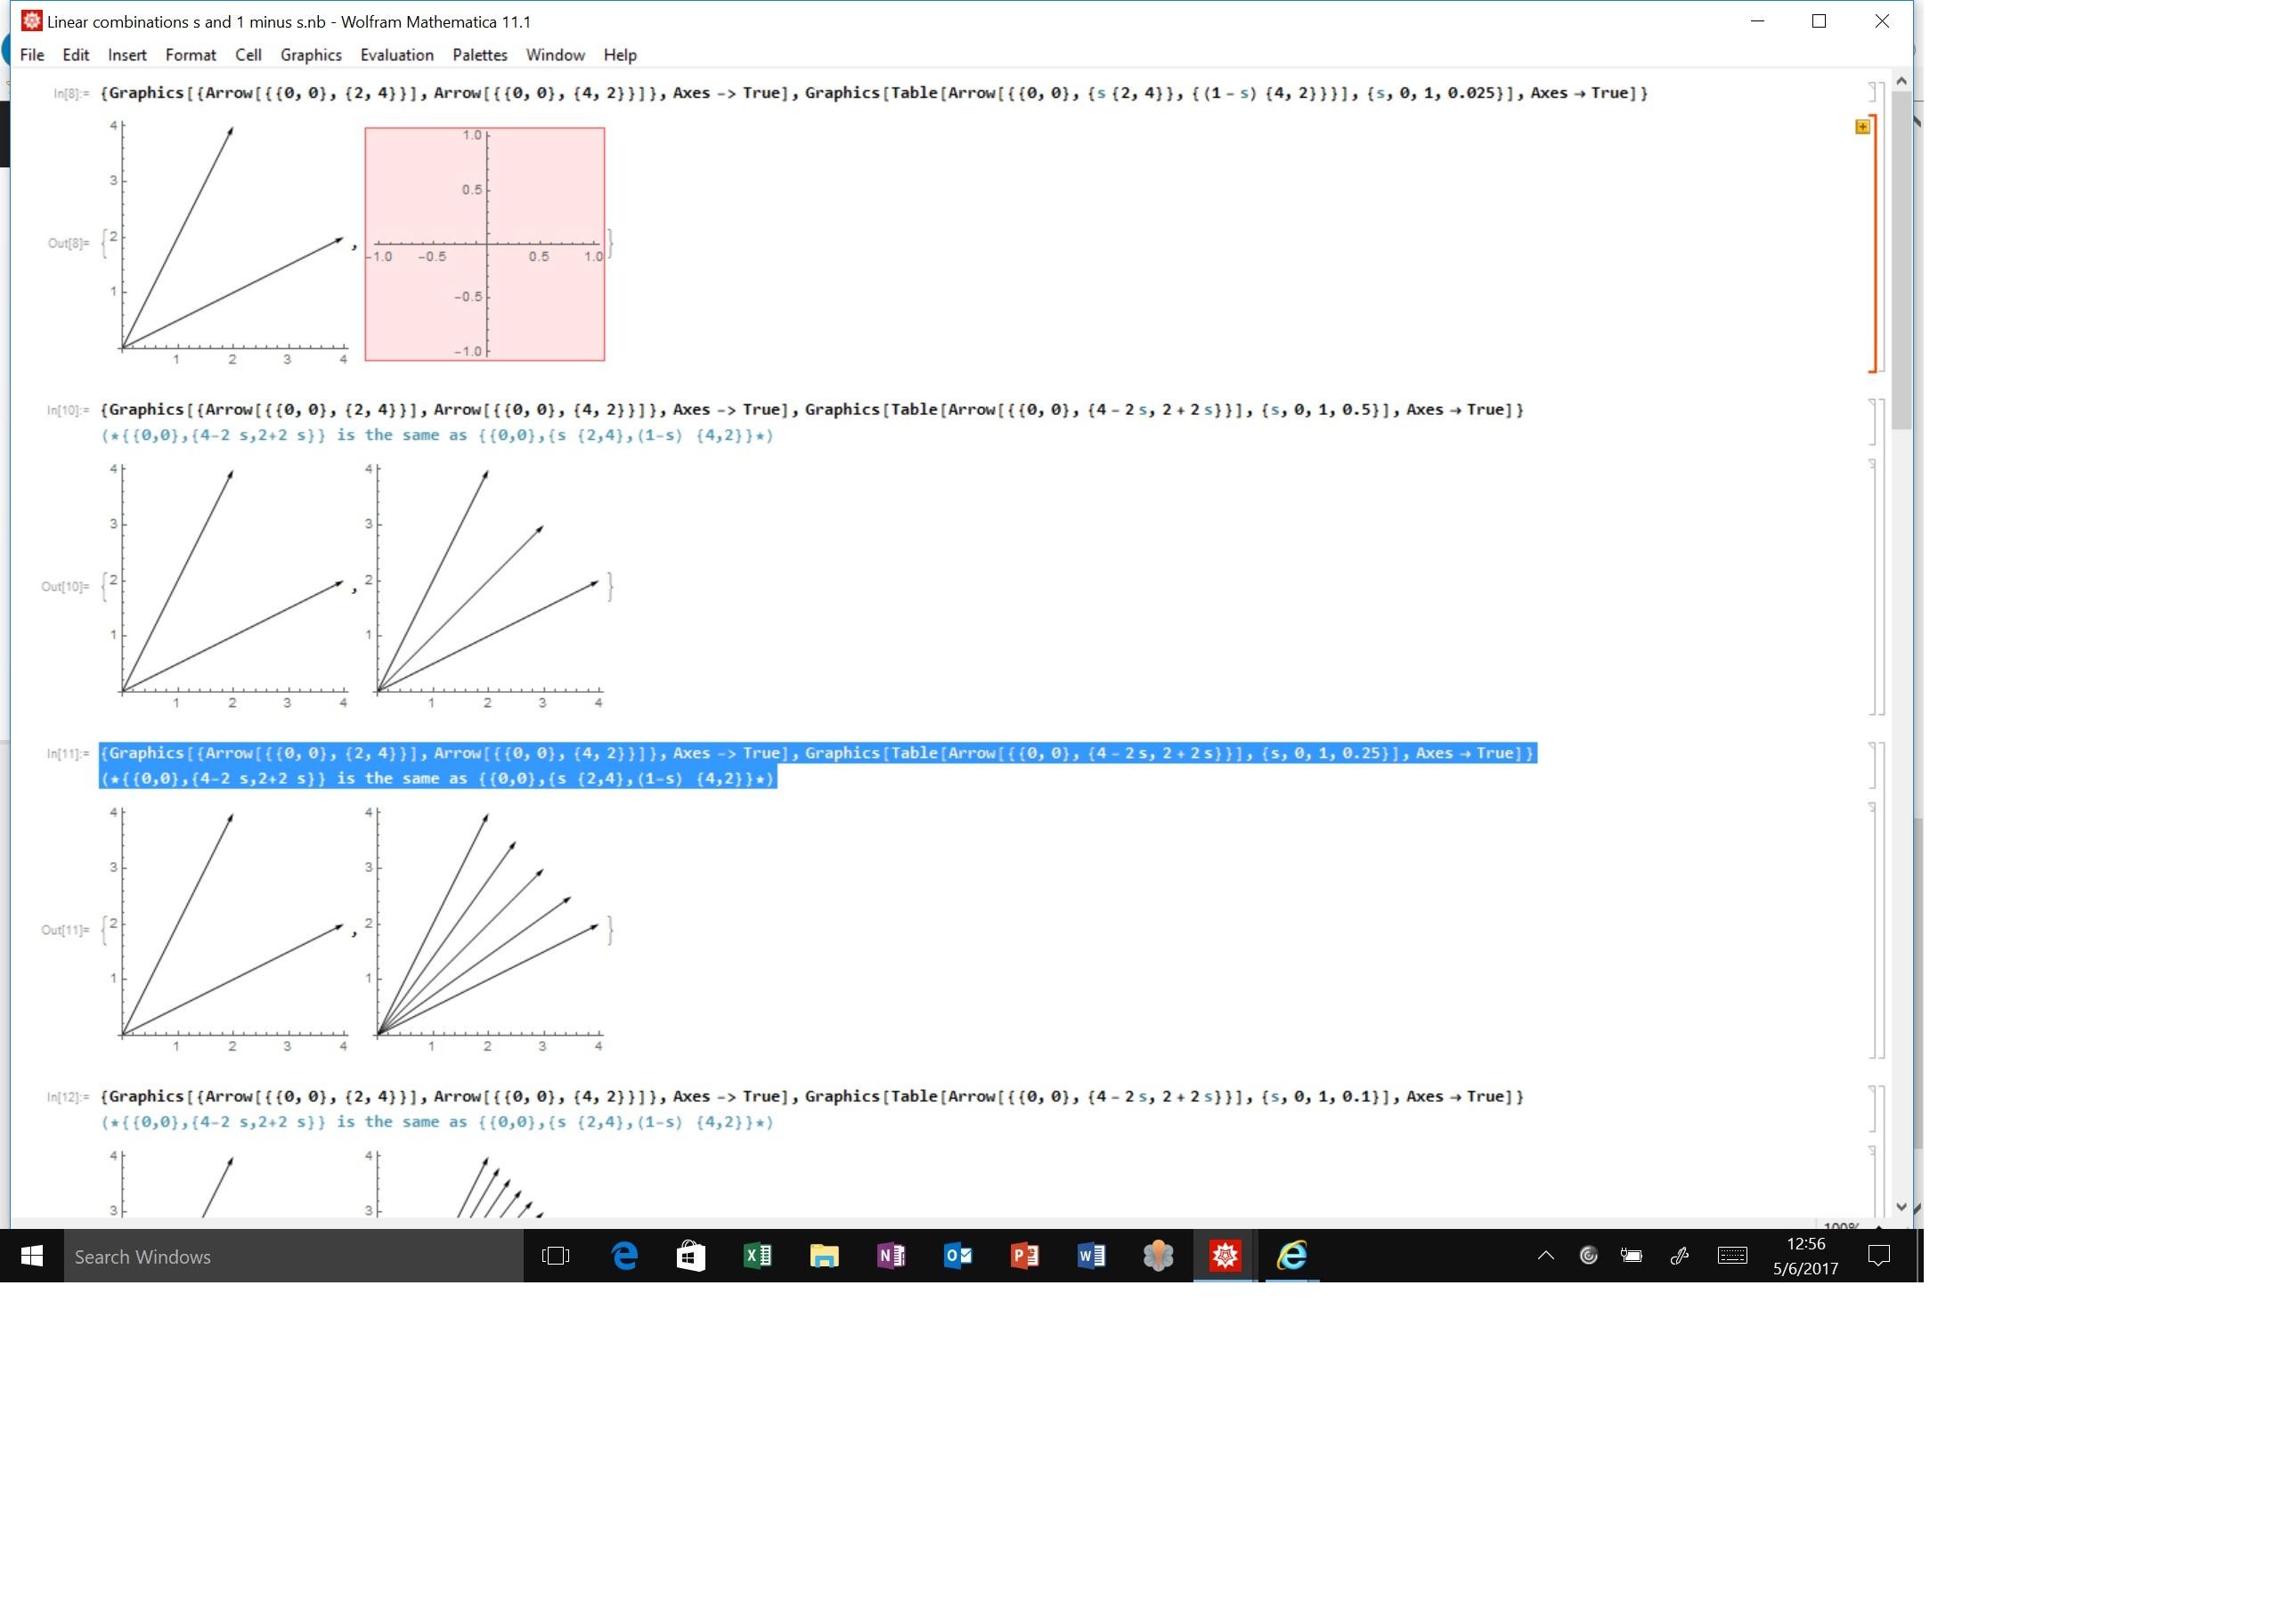 getImageAttachment?filename=Linearcombinationcoefficientsand1minuss.jpg&userId=965735